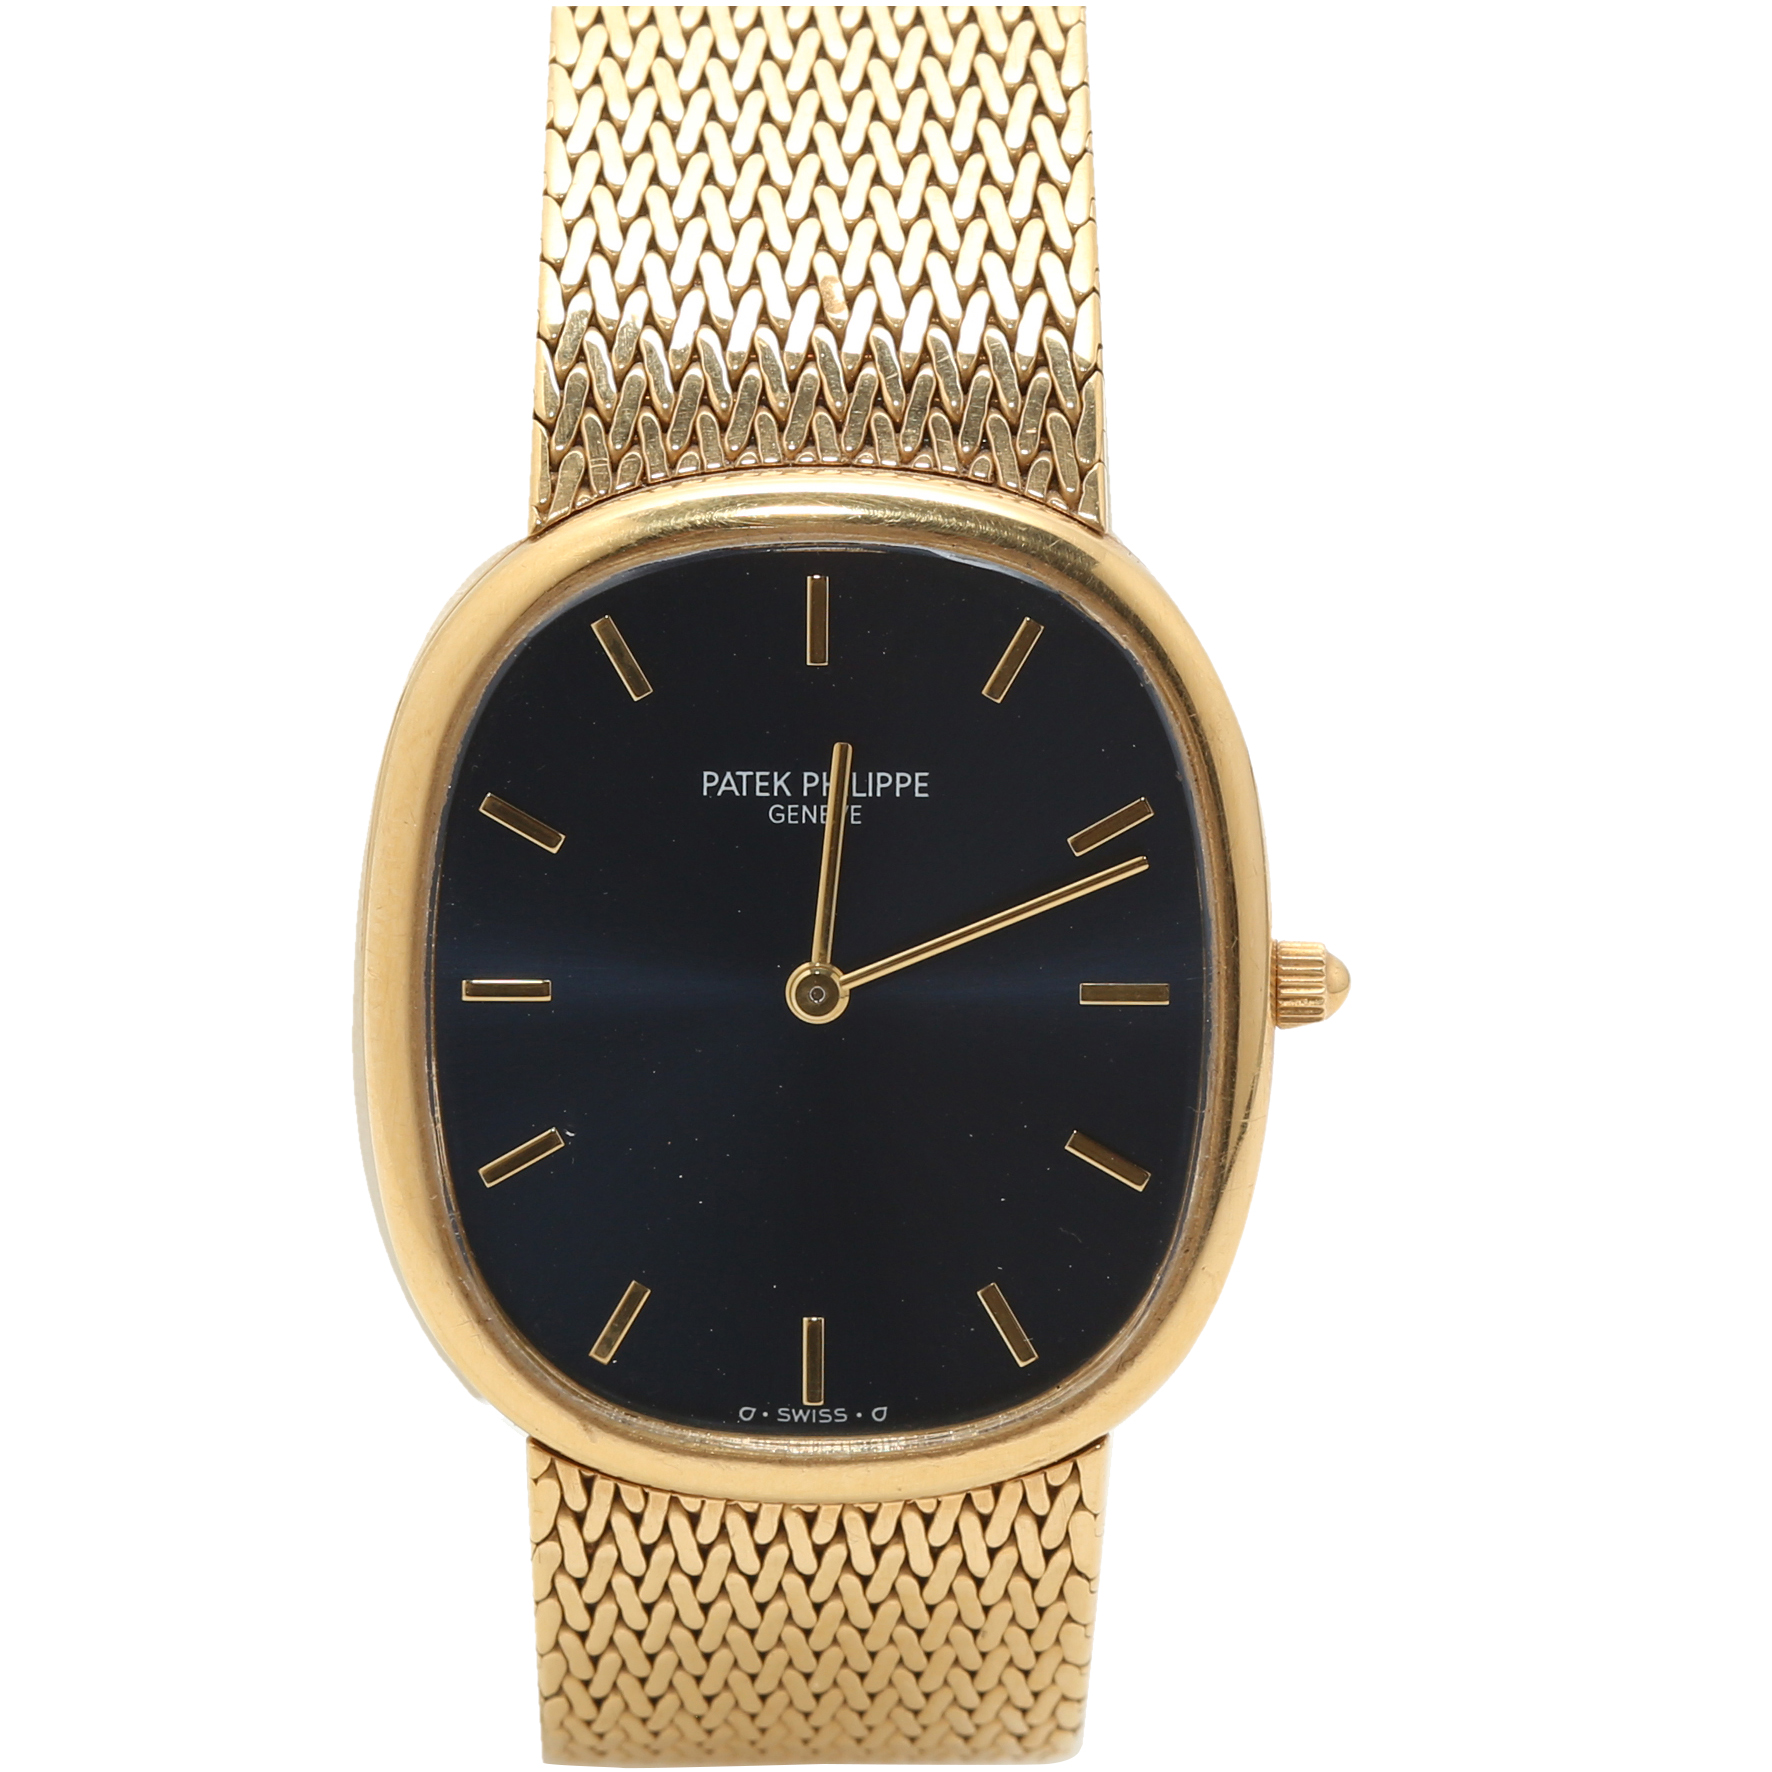 b7f0aeaf2 Buy Patek Philippe Dark Blue 18K Yellow Gold Ellipse 3738/122 Men's  Wristwatch 31MM 198965 at best price | TLC